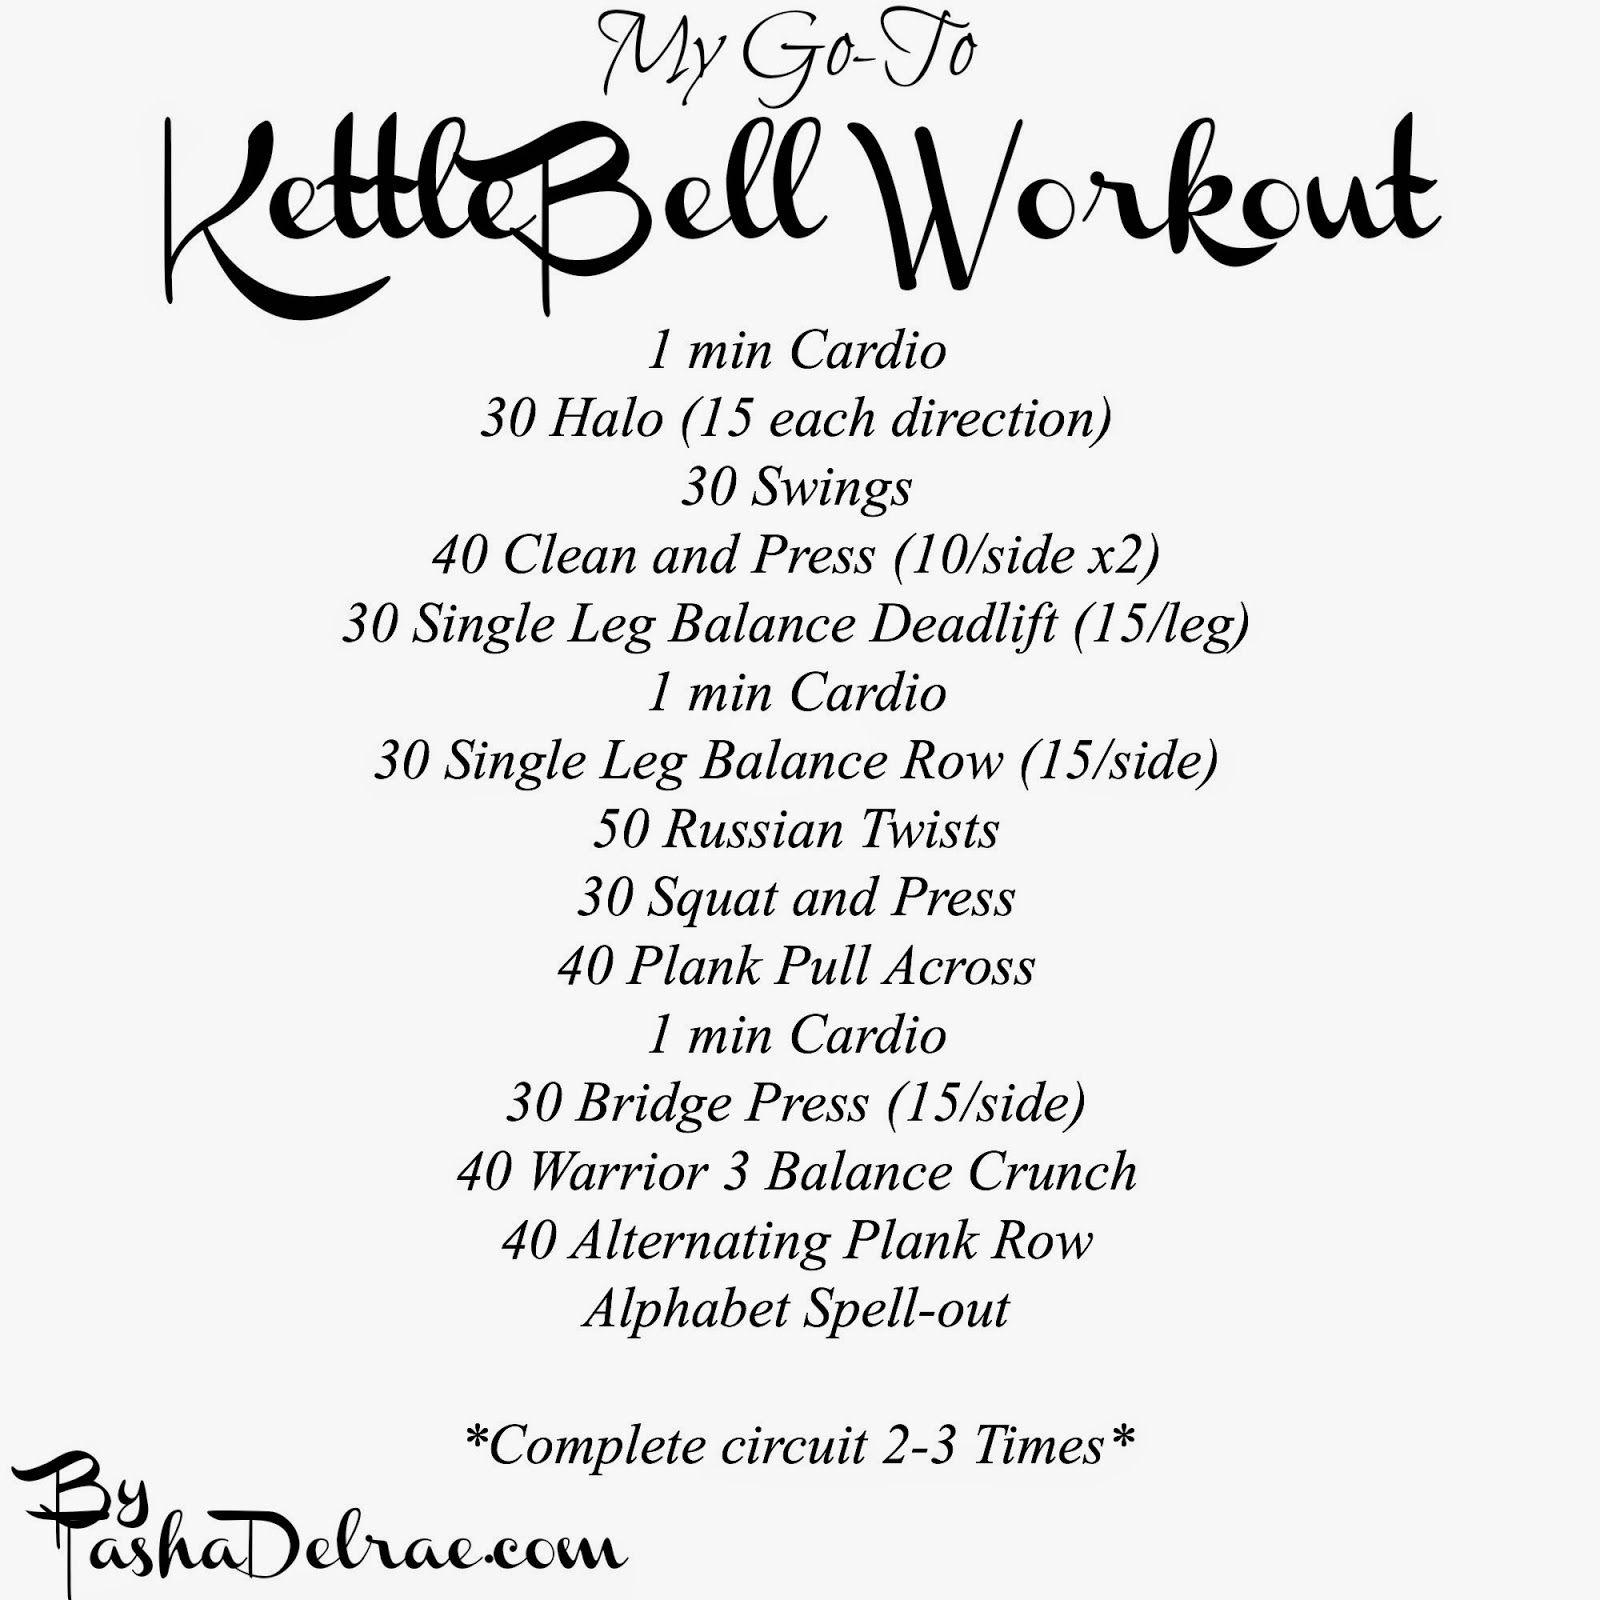 wellness wednesday  my favourite go to workout